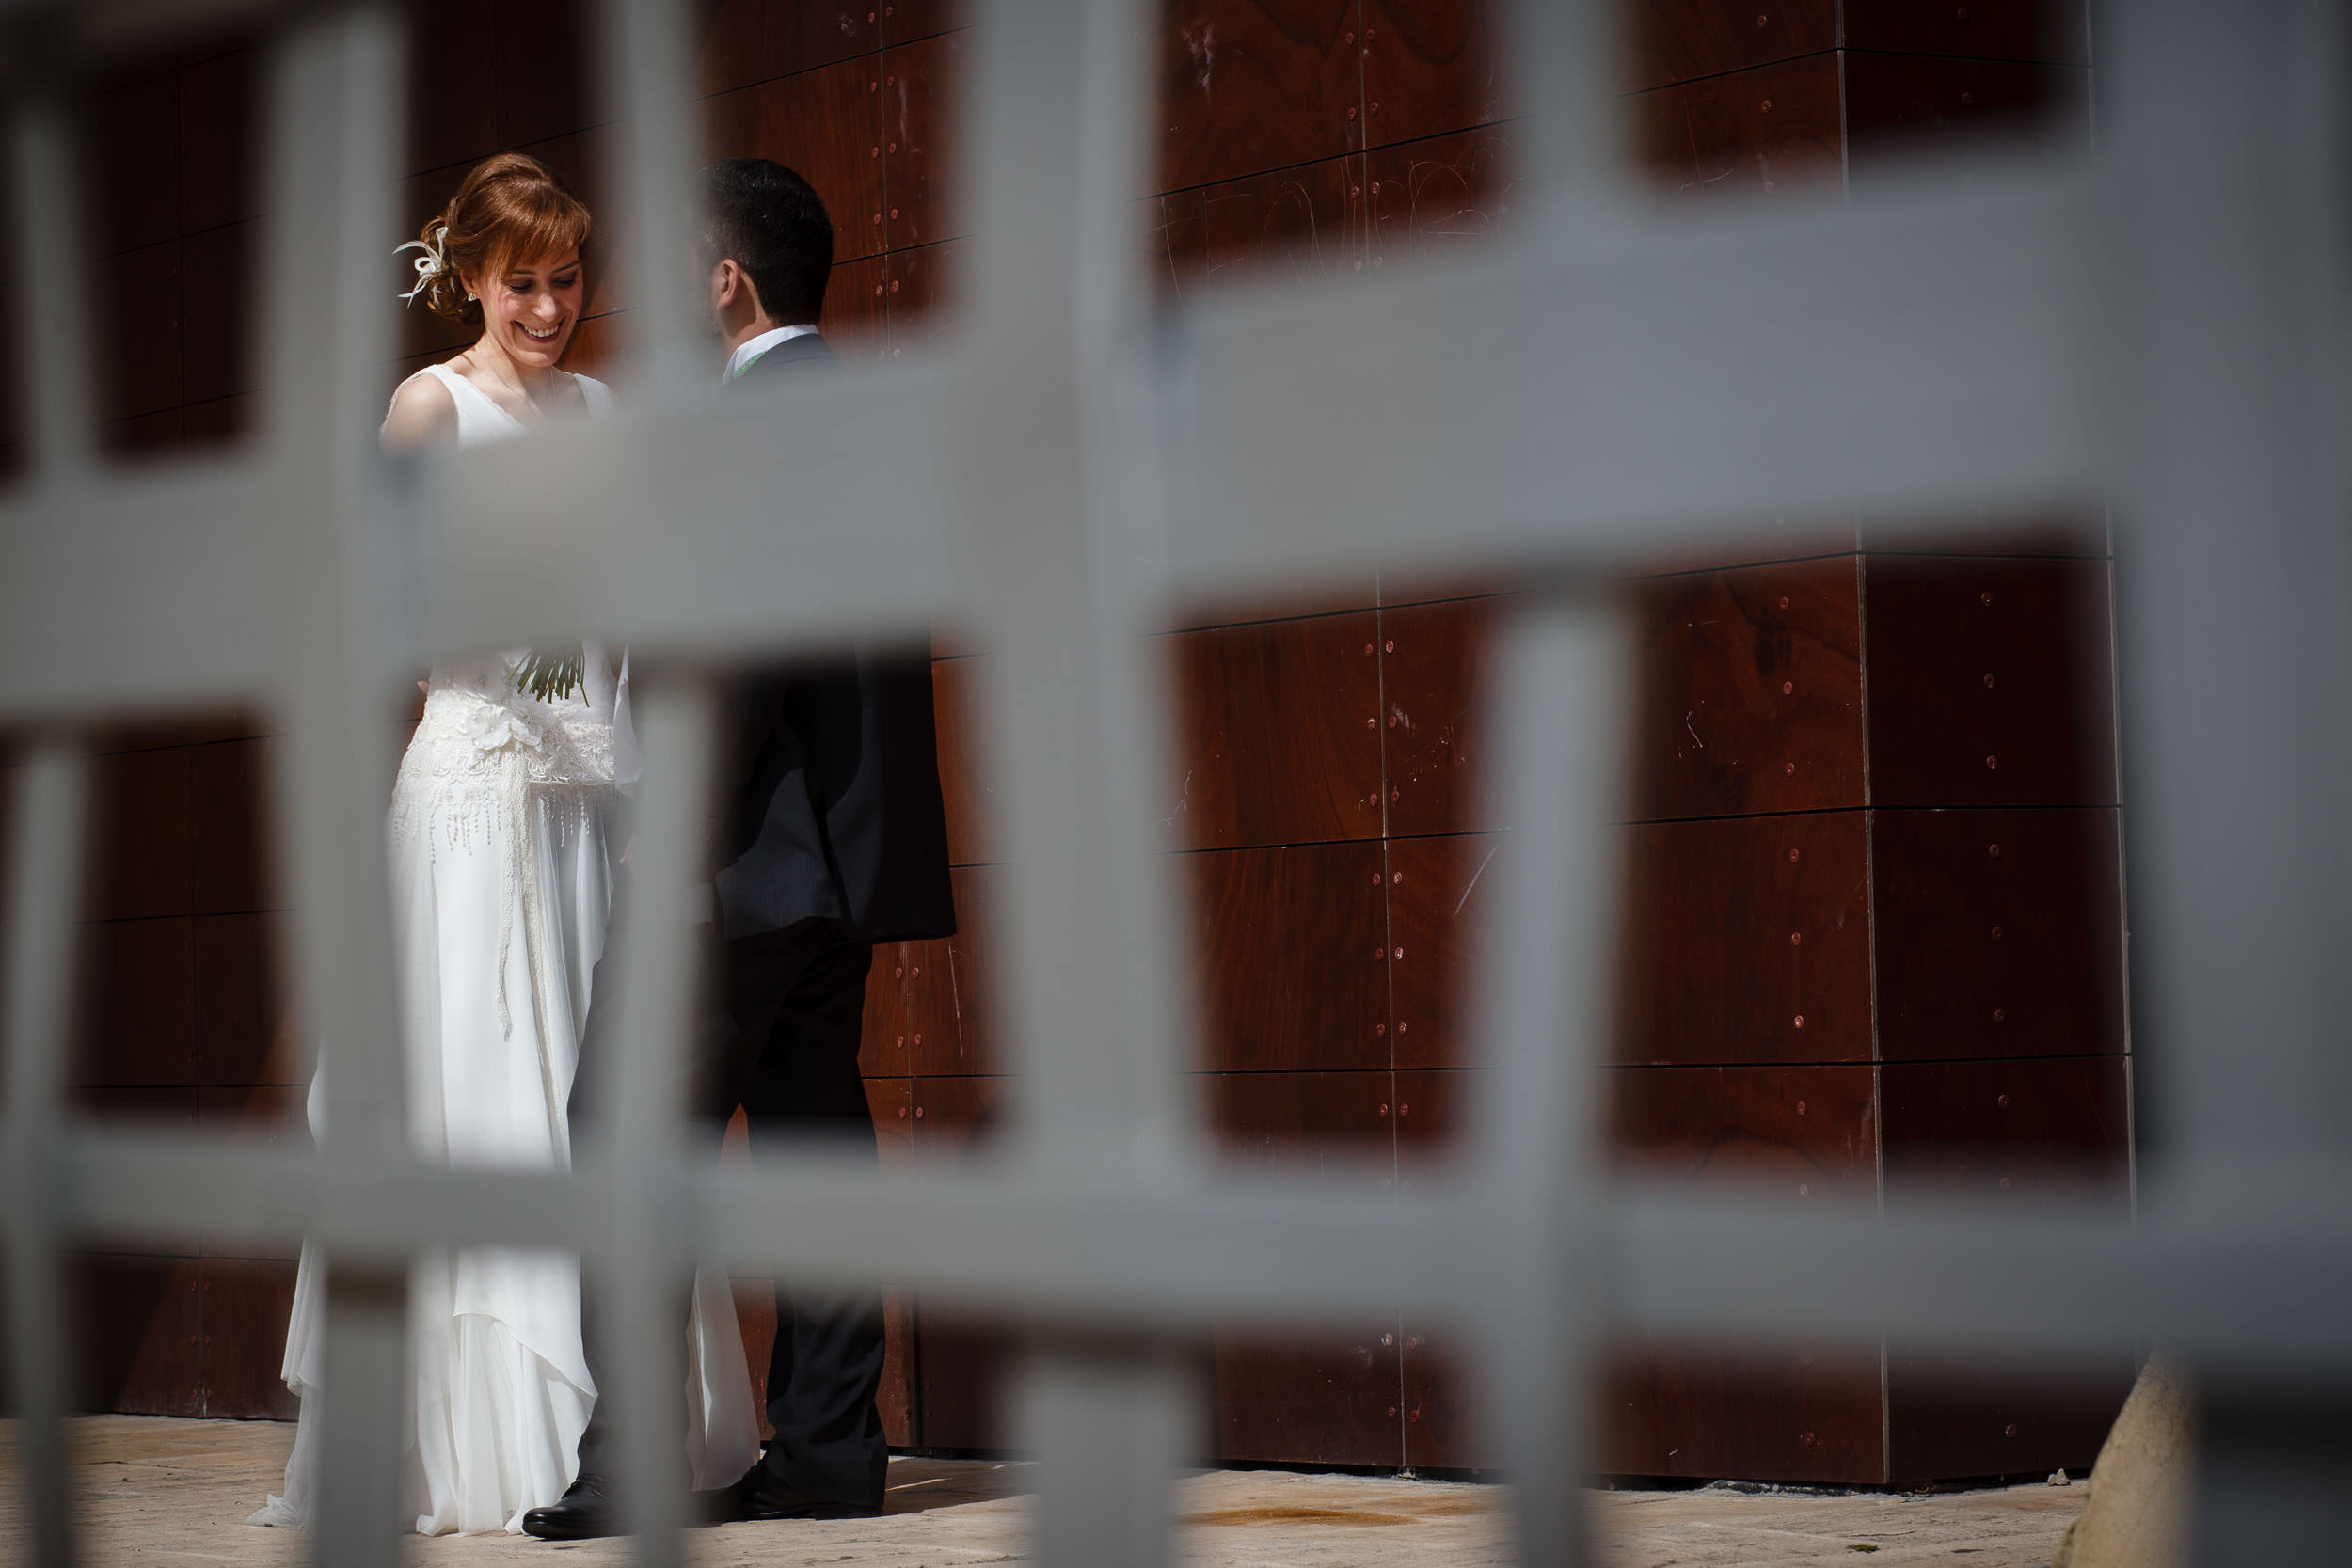 Engagement photography in Portugalete, Basque Country, Spain - James Sturcke  Photographer | sturcke.org_005.jpg